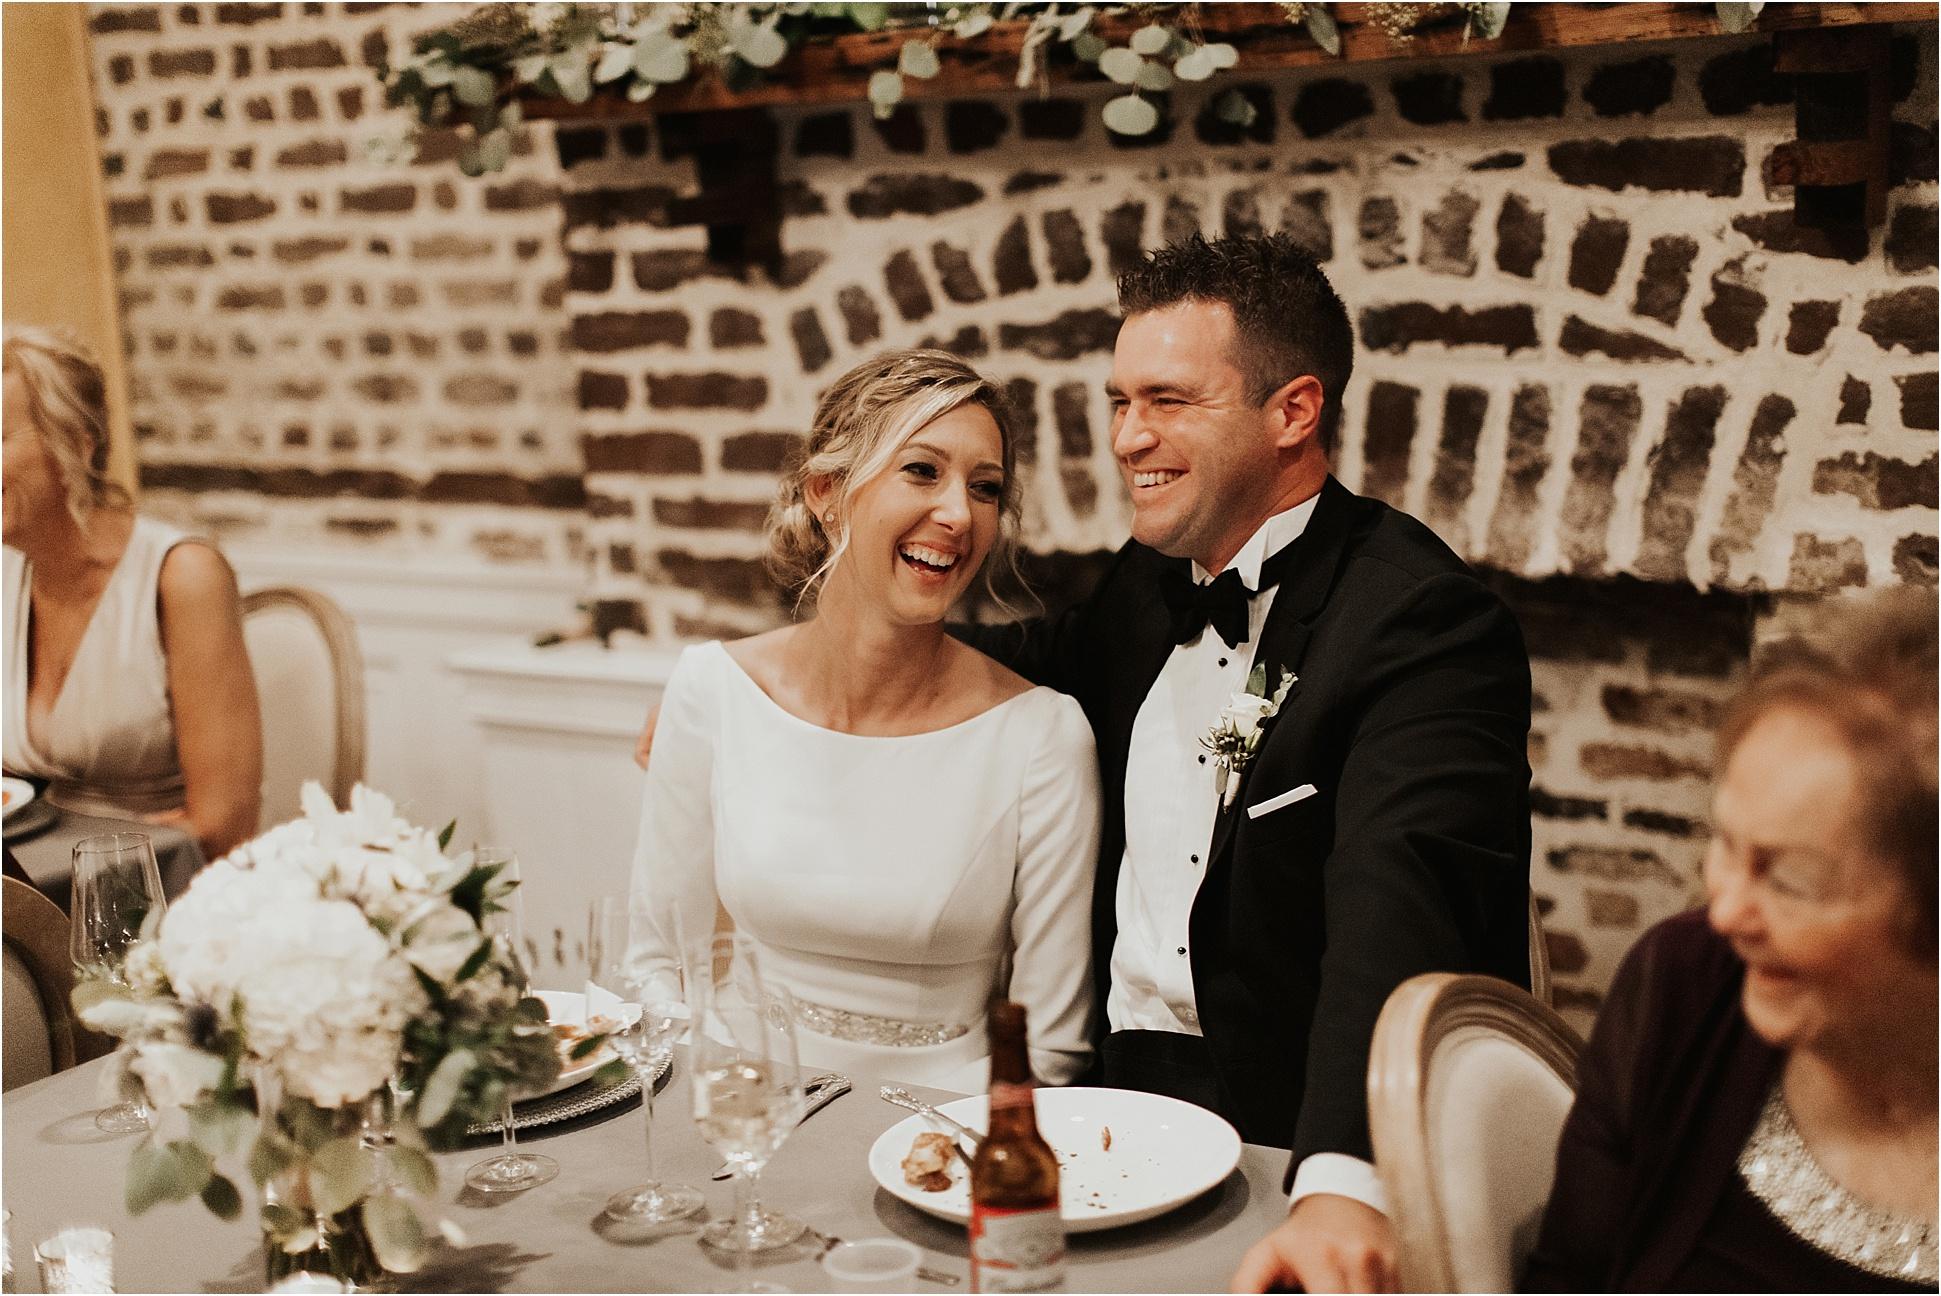 upstairs_midtown_intimate_charleston_wedding074.JPG